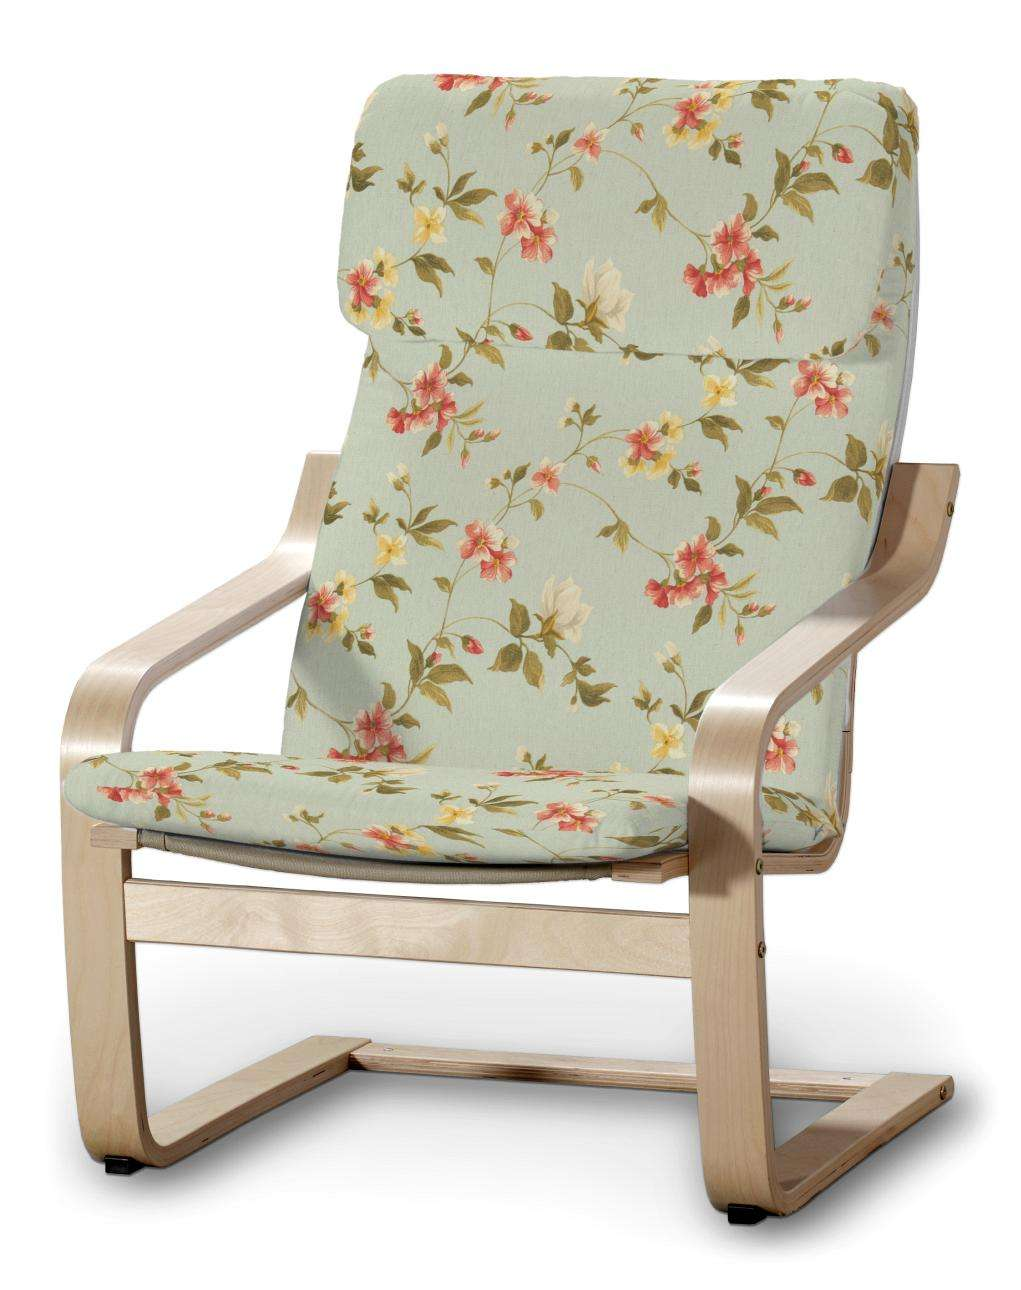 Poäng Sesselbezug I Sessel Poäng von der Kollektion Londres, Stoff: 124-65